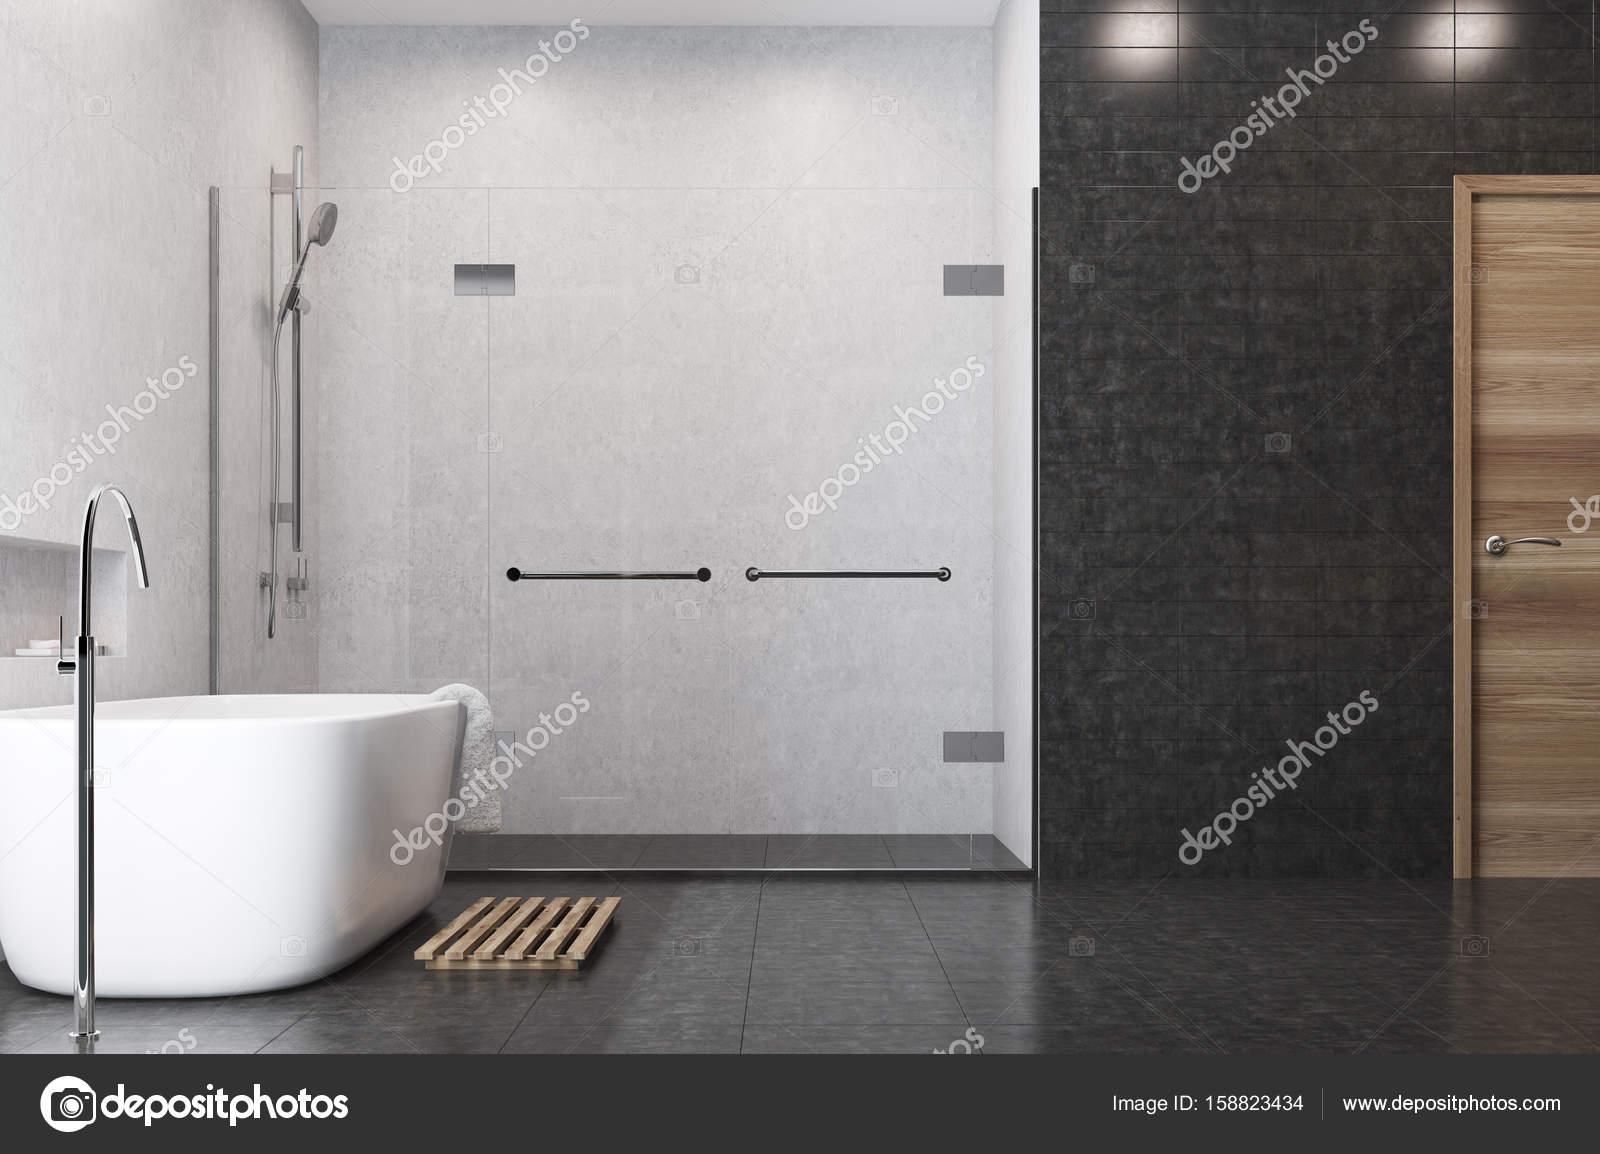 Zwarte Tegels Badkamer : Witte badkamer zwarte tegels douchezijde u stockfoto